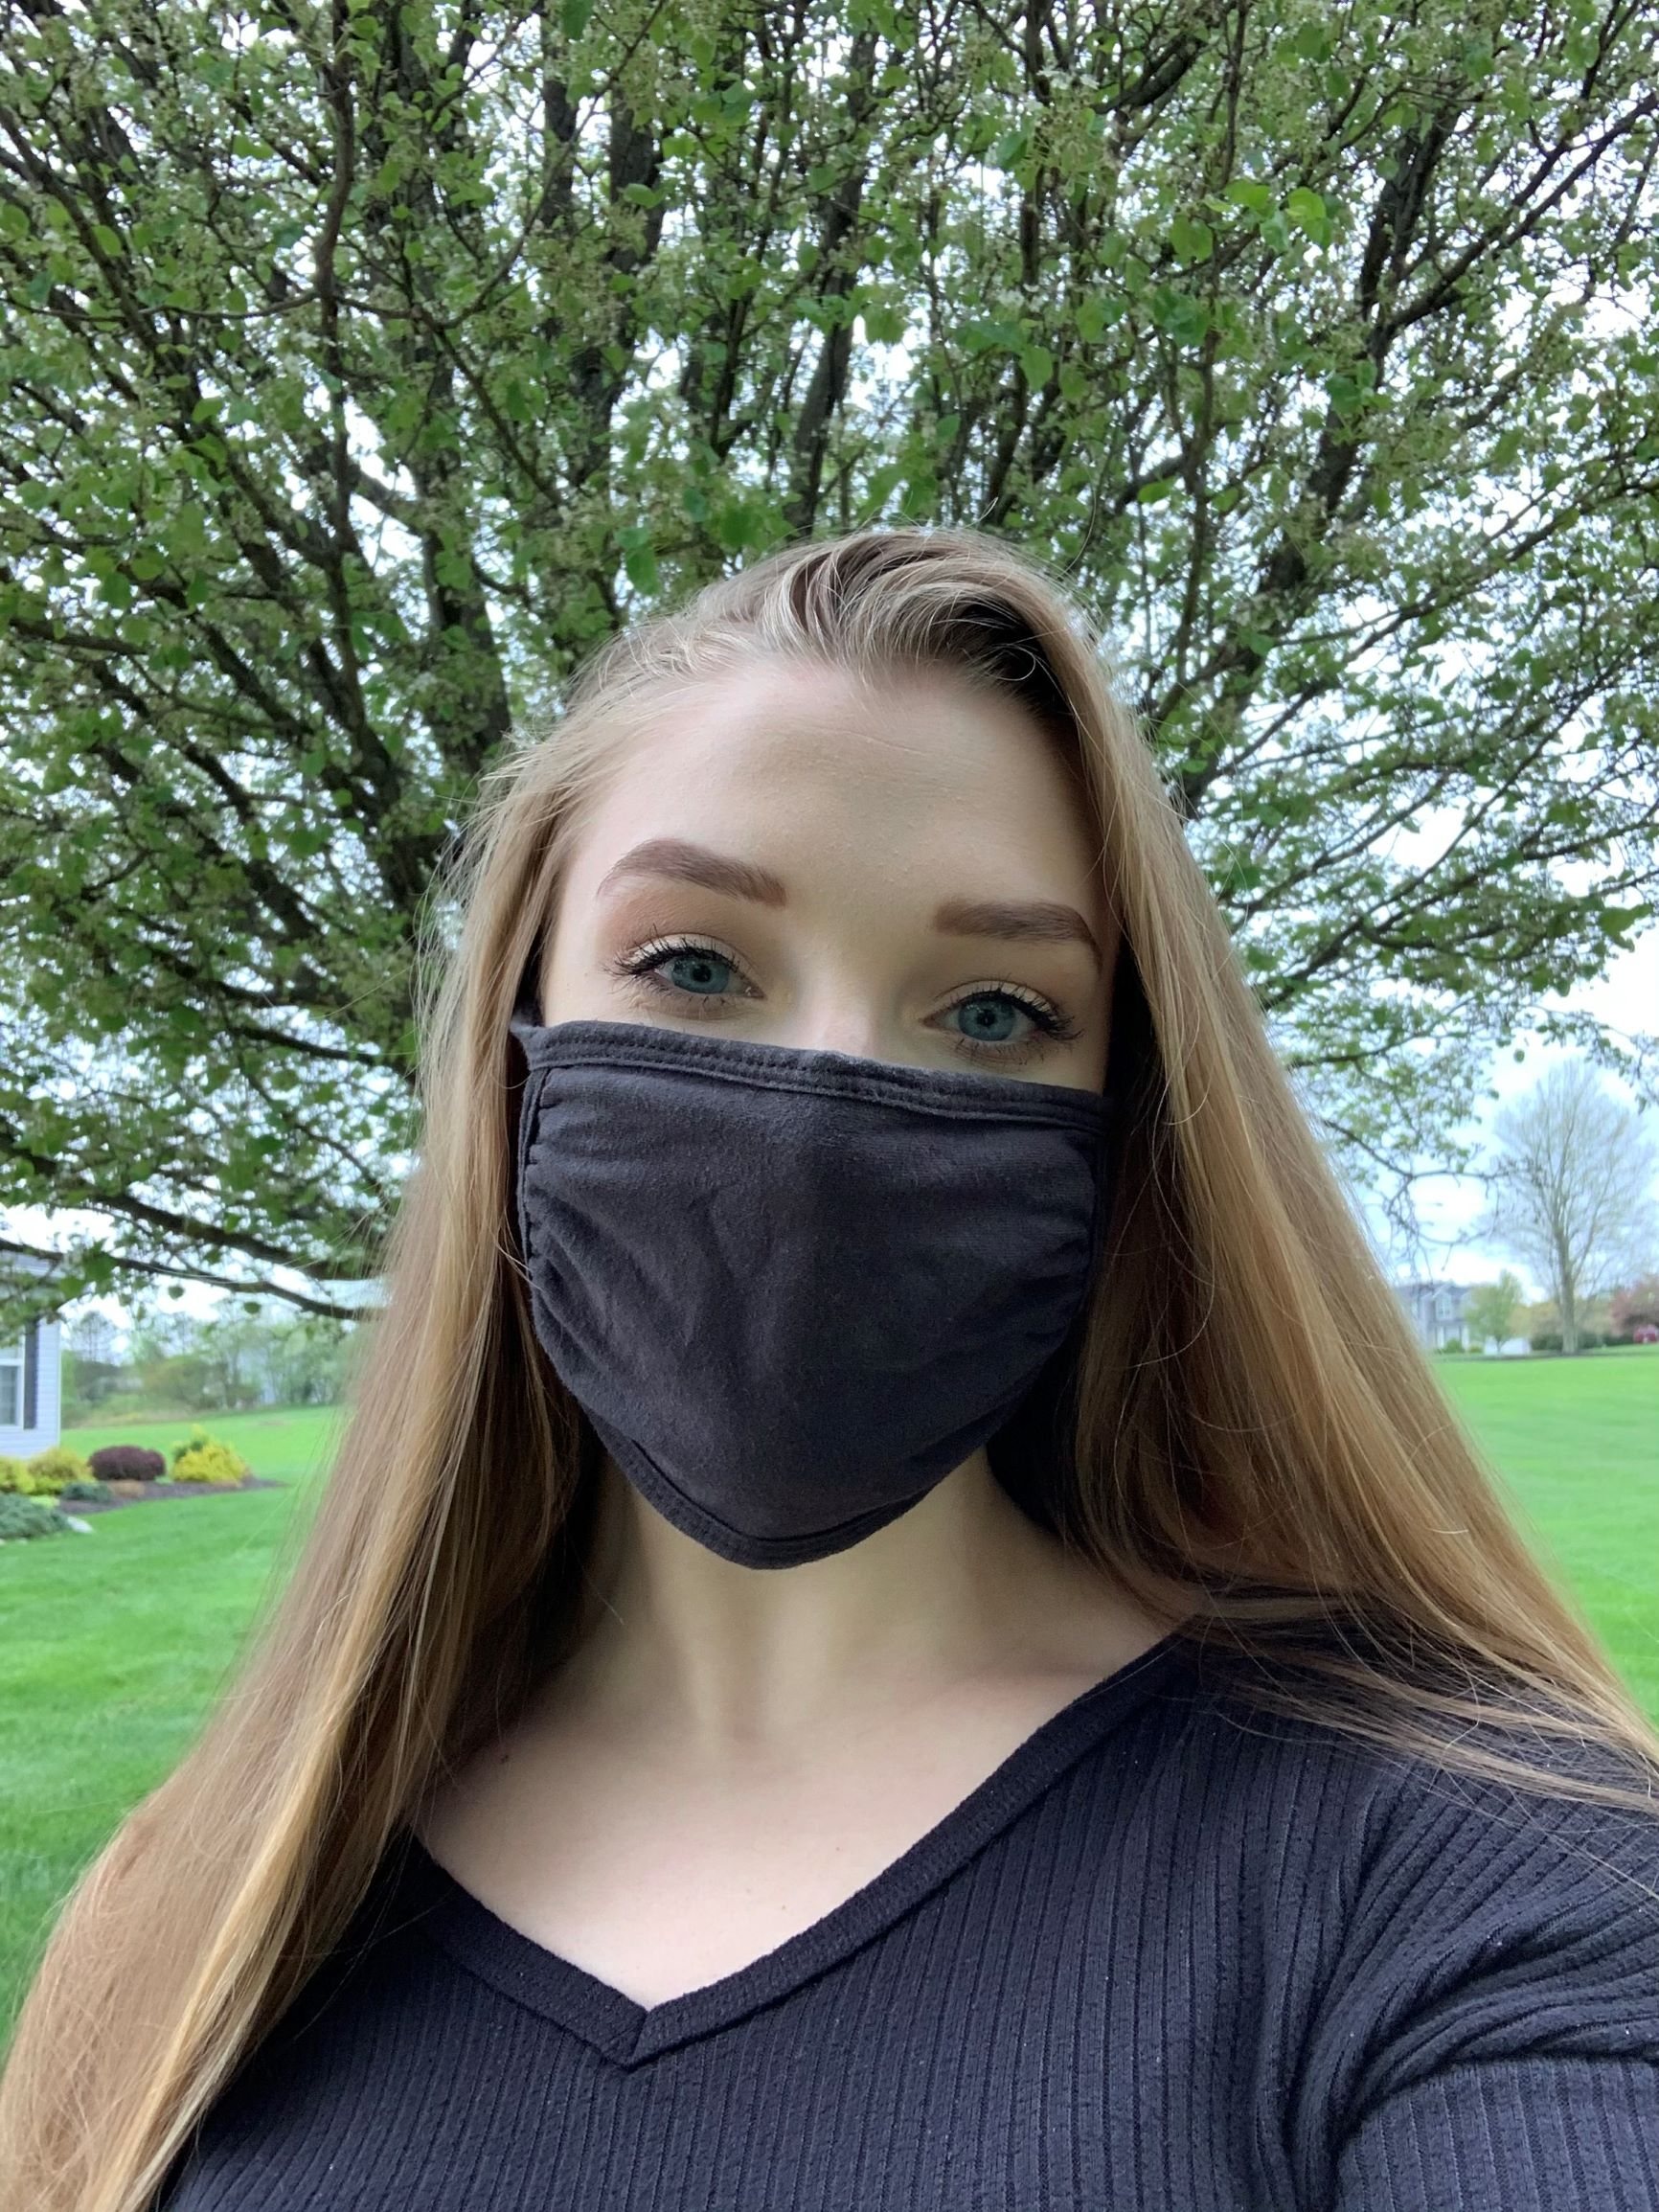 Gabriella wearing a mask outside in Wadsworth, Ohio.